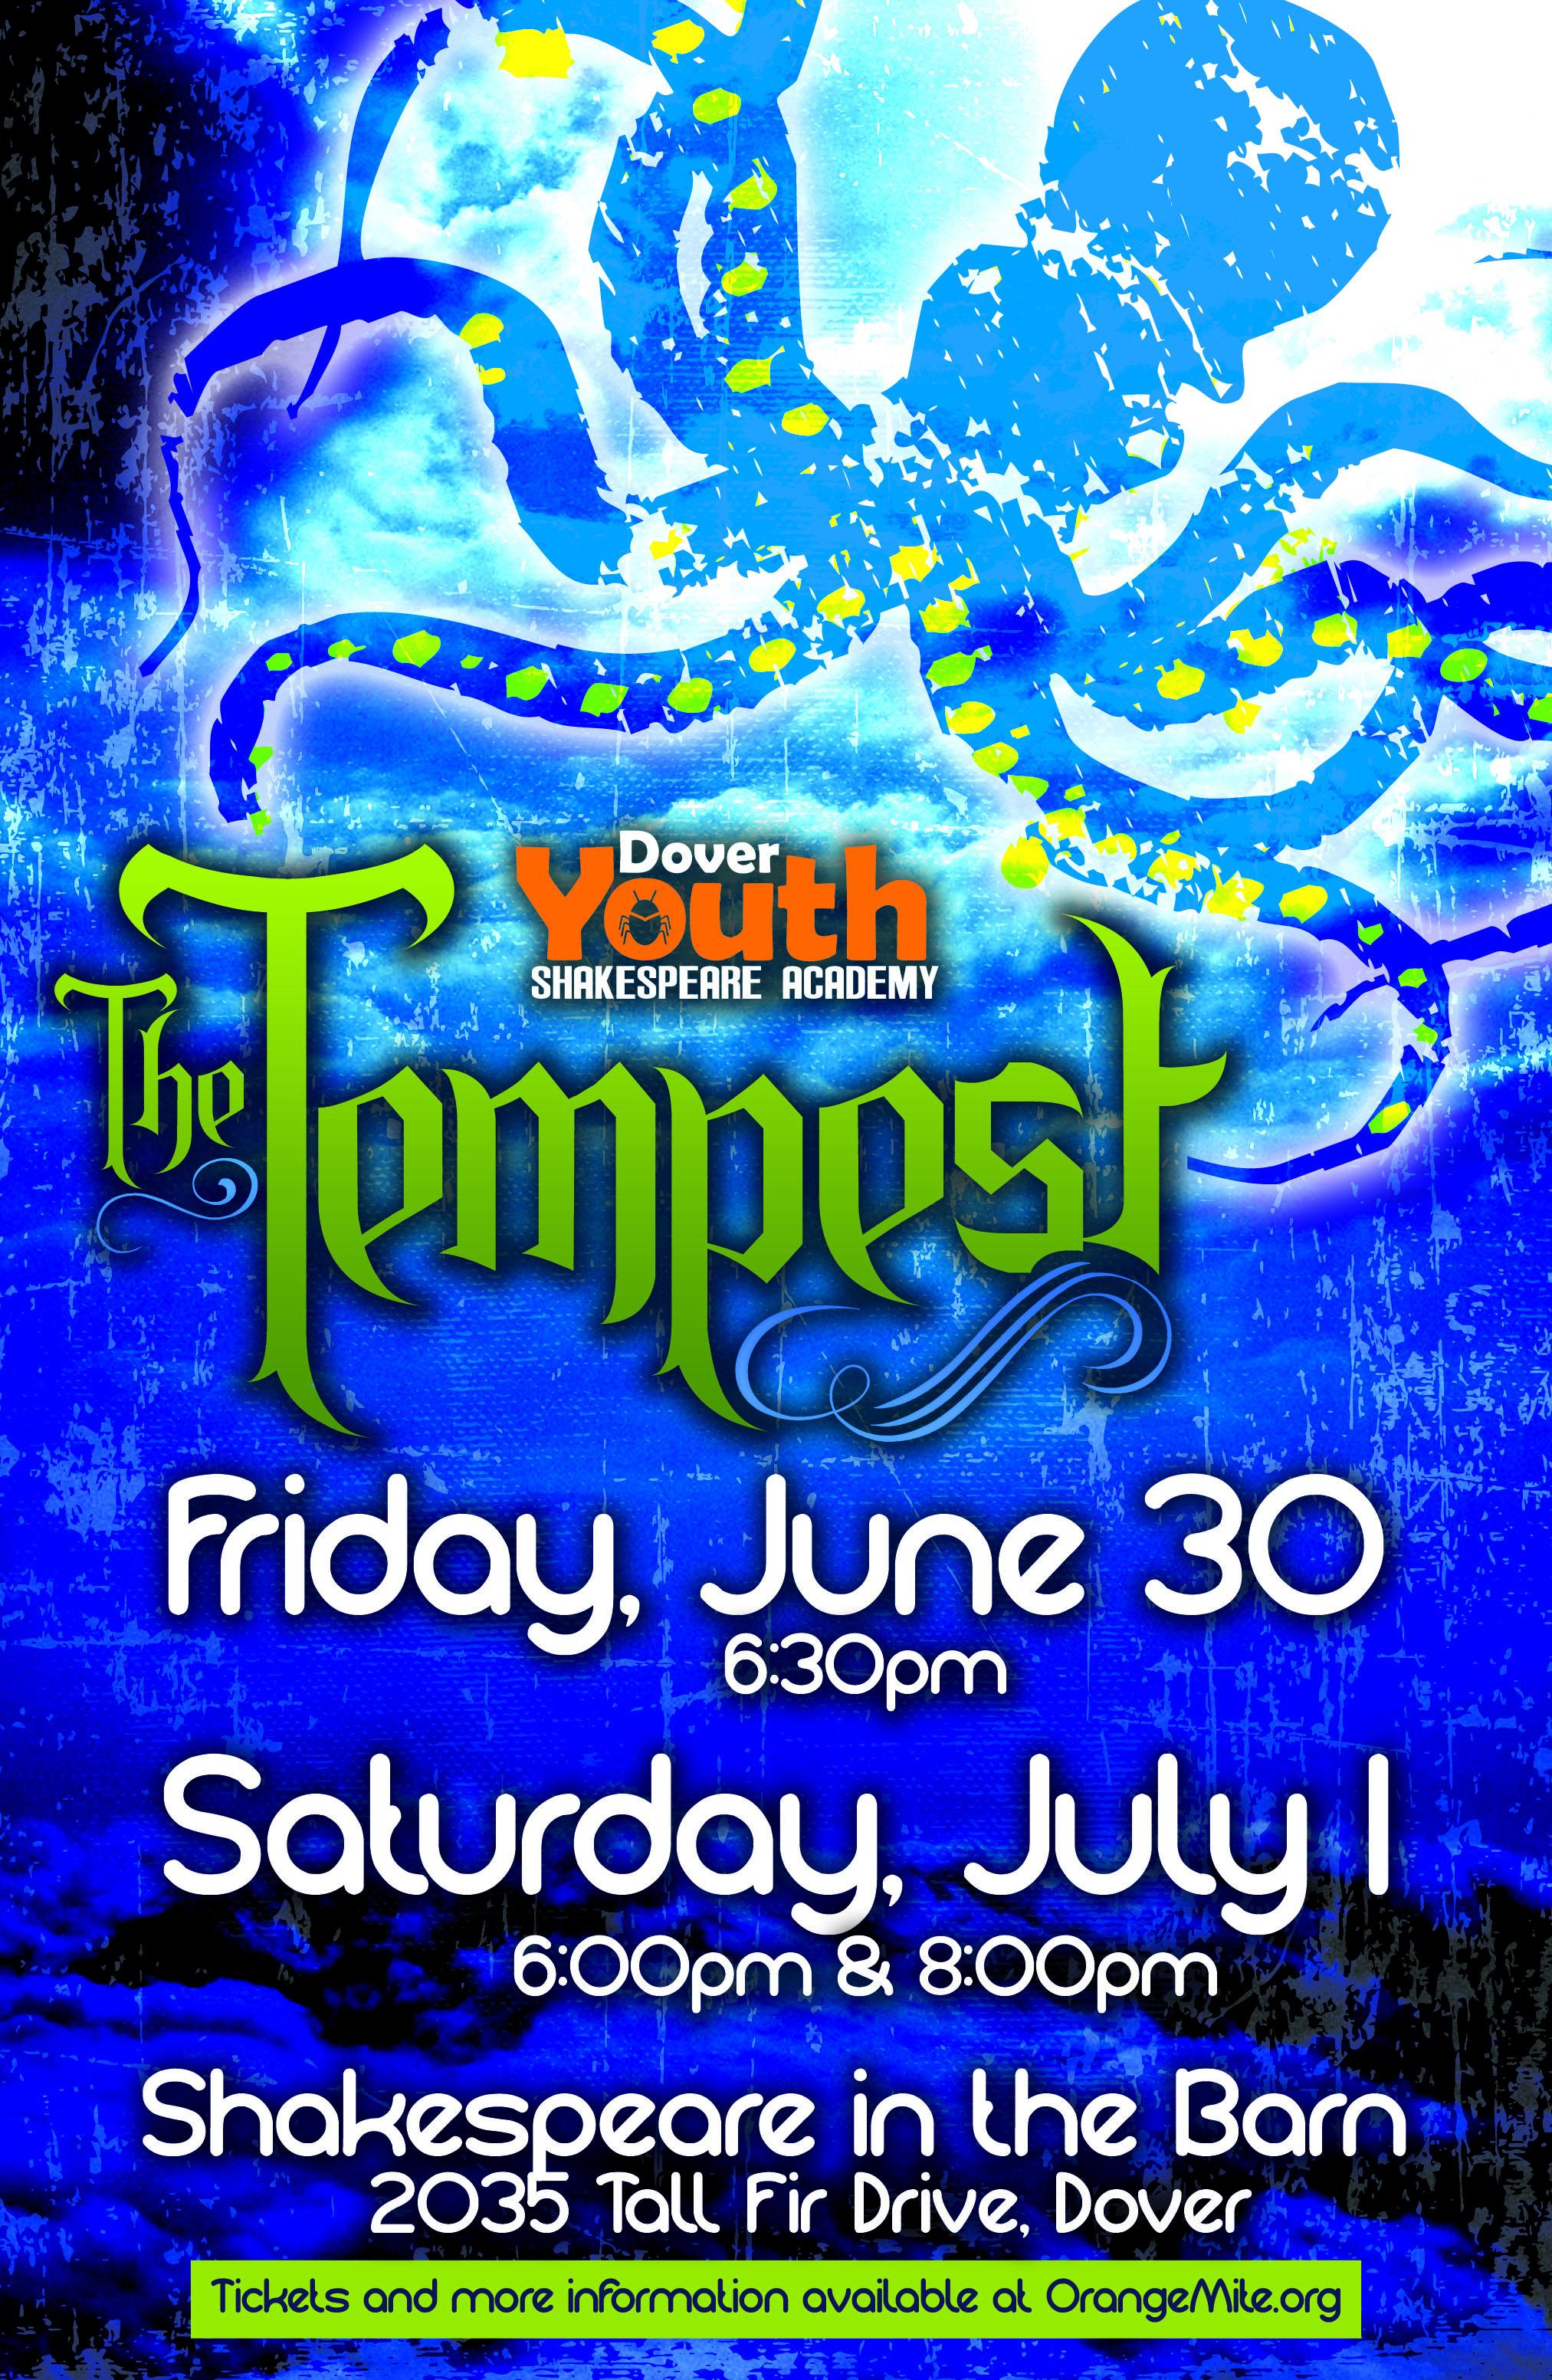 Tempest copy.jpg